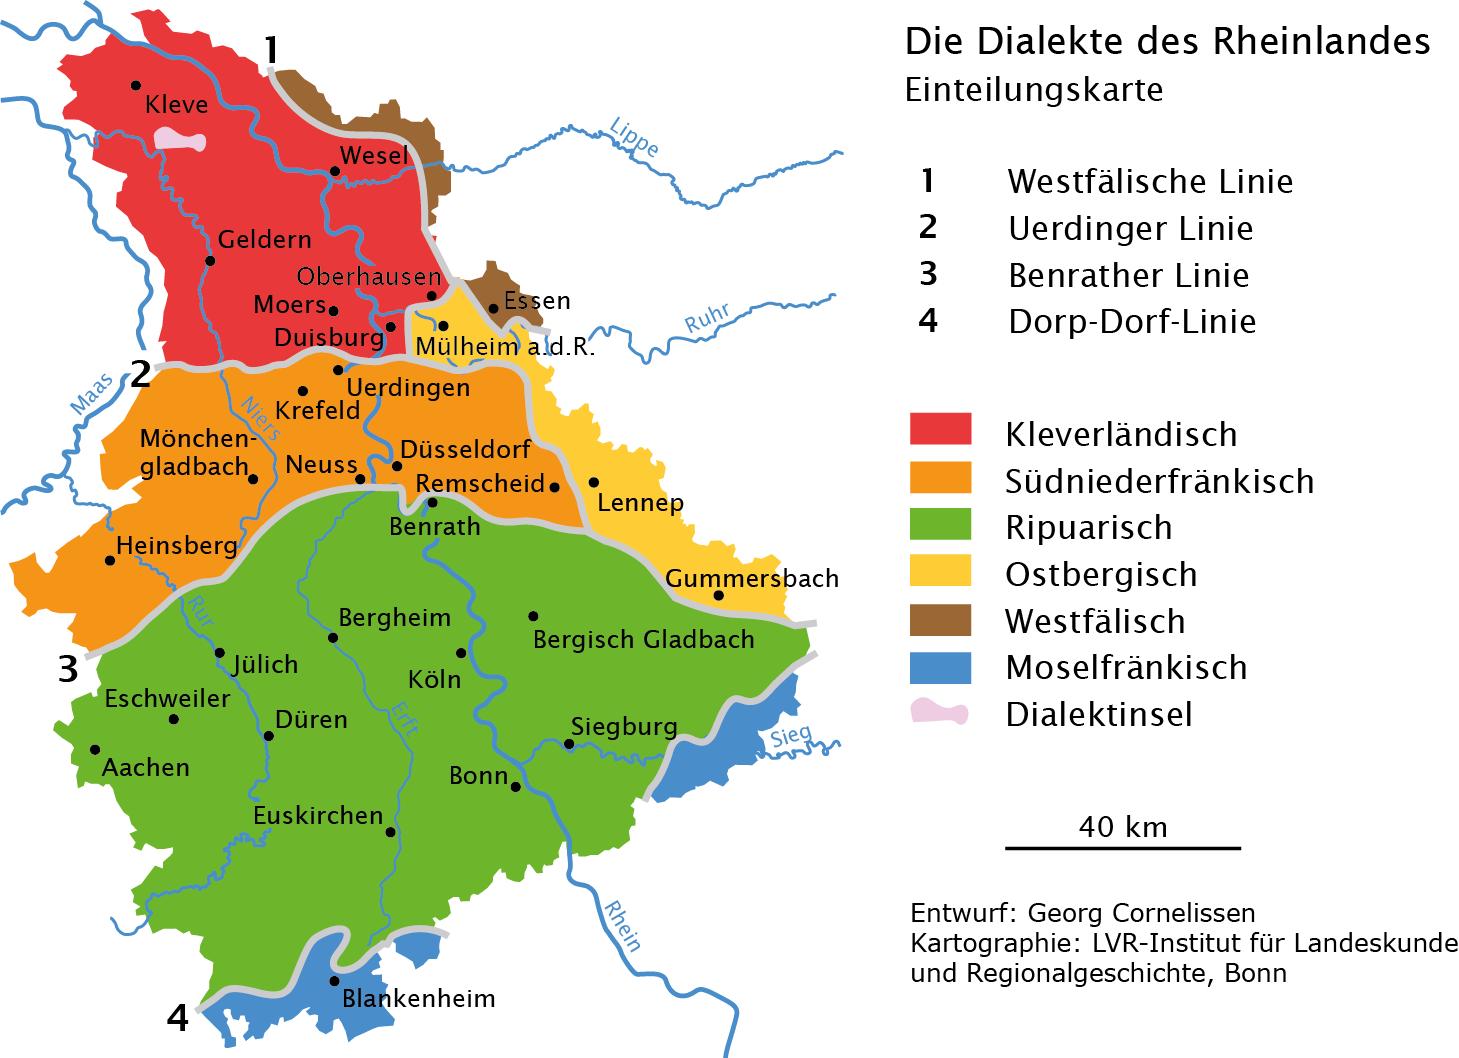 alarm bergisch gladbach